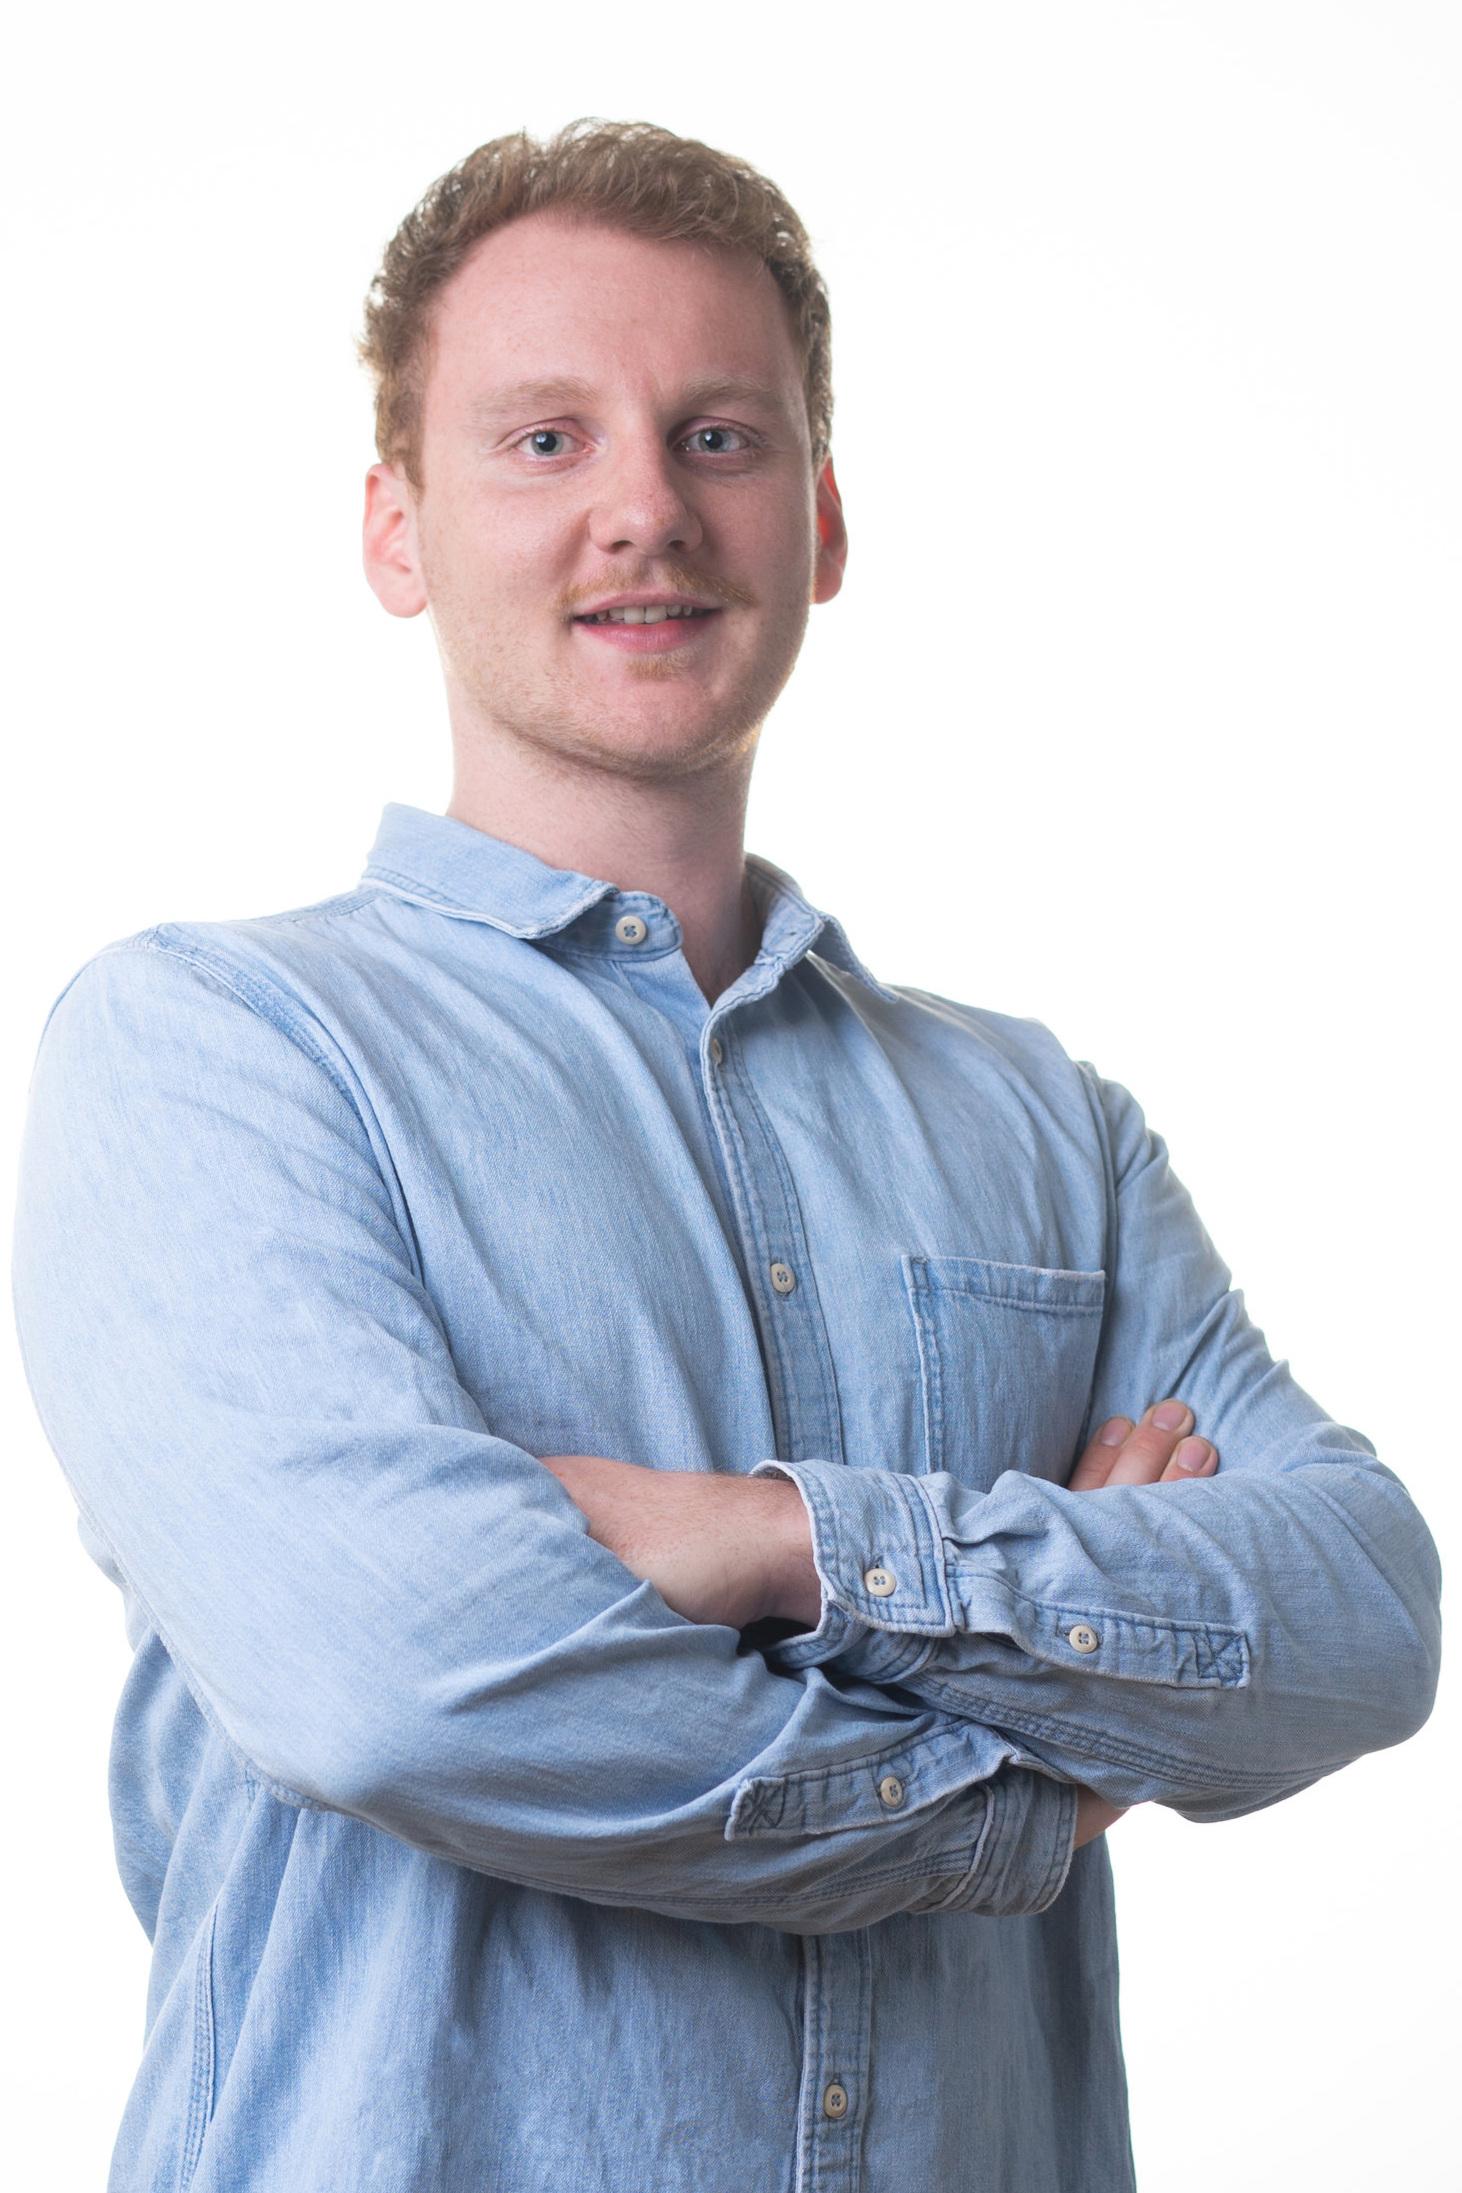 Leif KOZIK   8. Semester Humanmedizin  Generalsekretär der ÖH